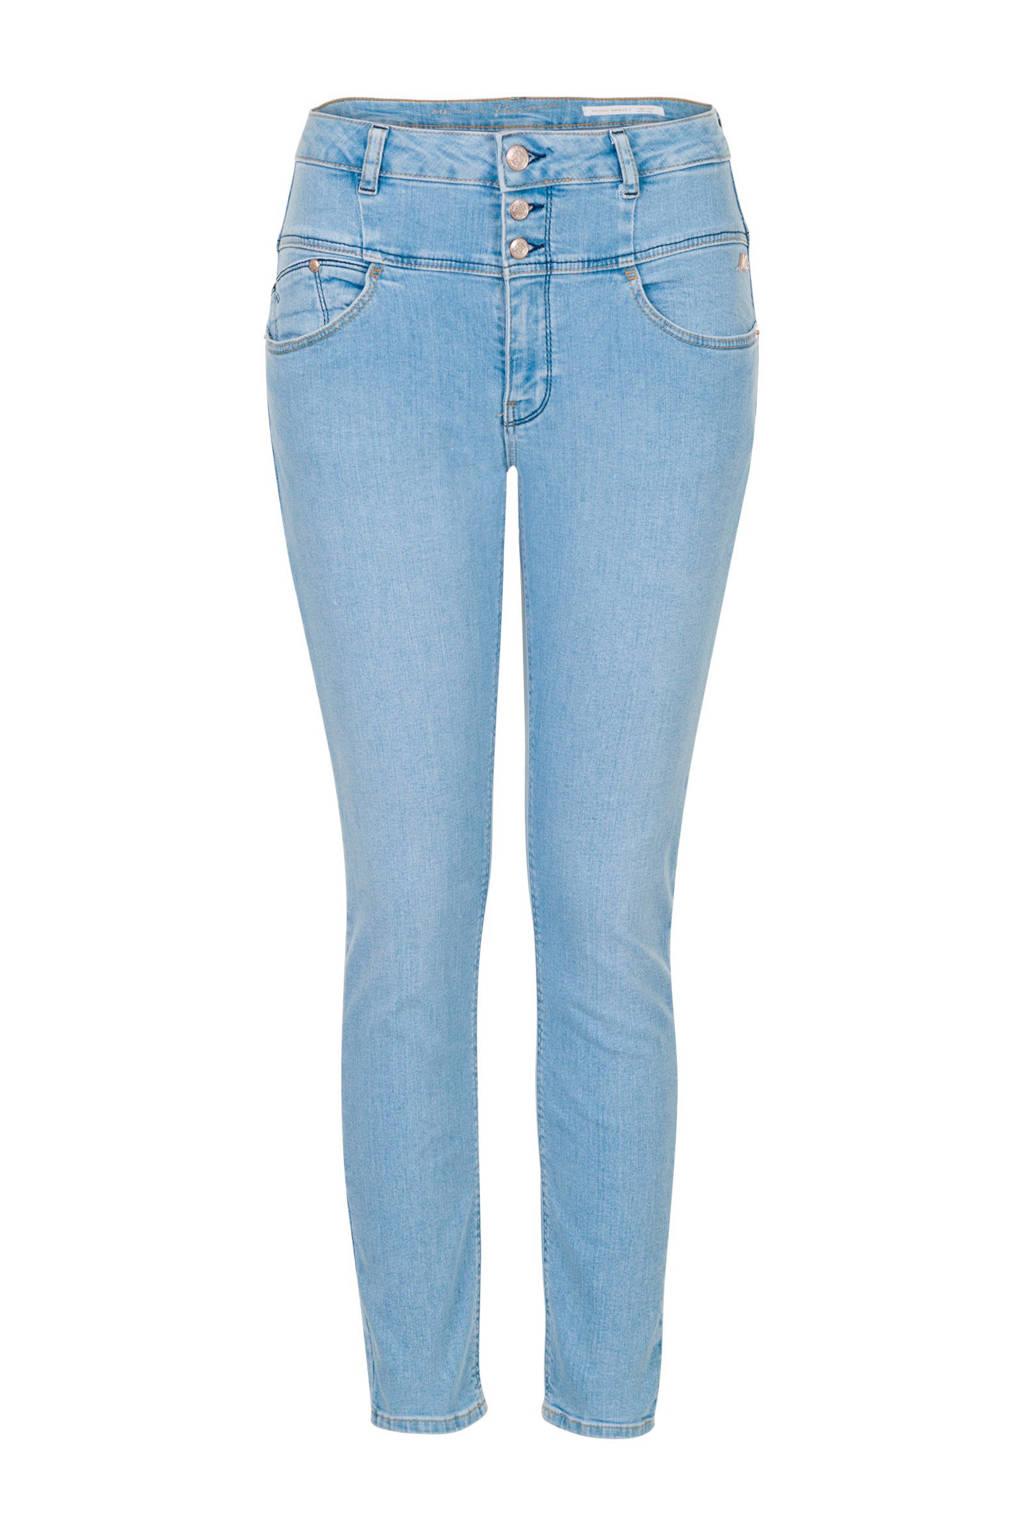 Miss Etam Regulier high waist skinny jeans, Blauw